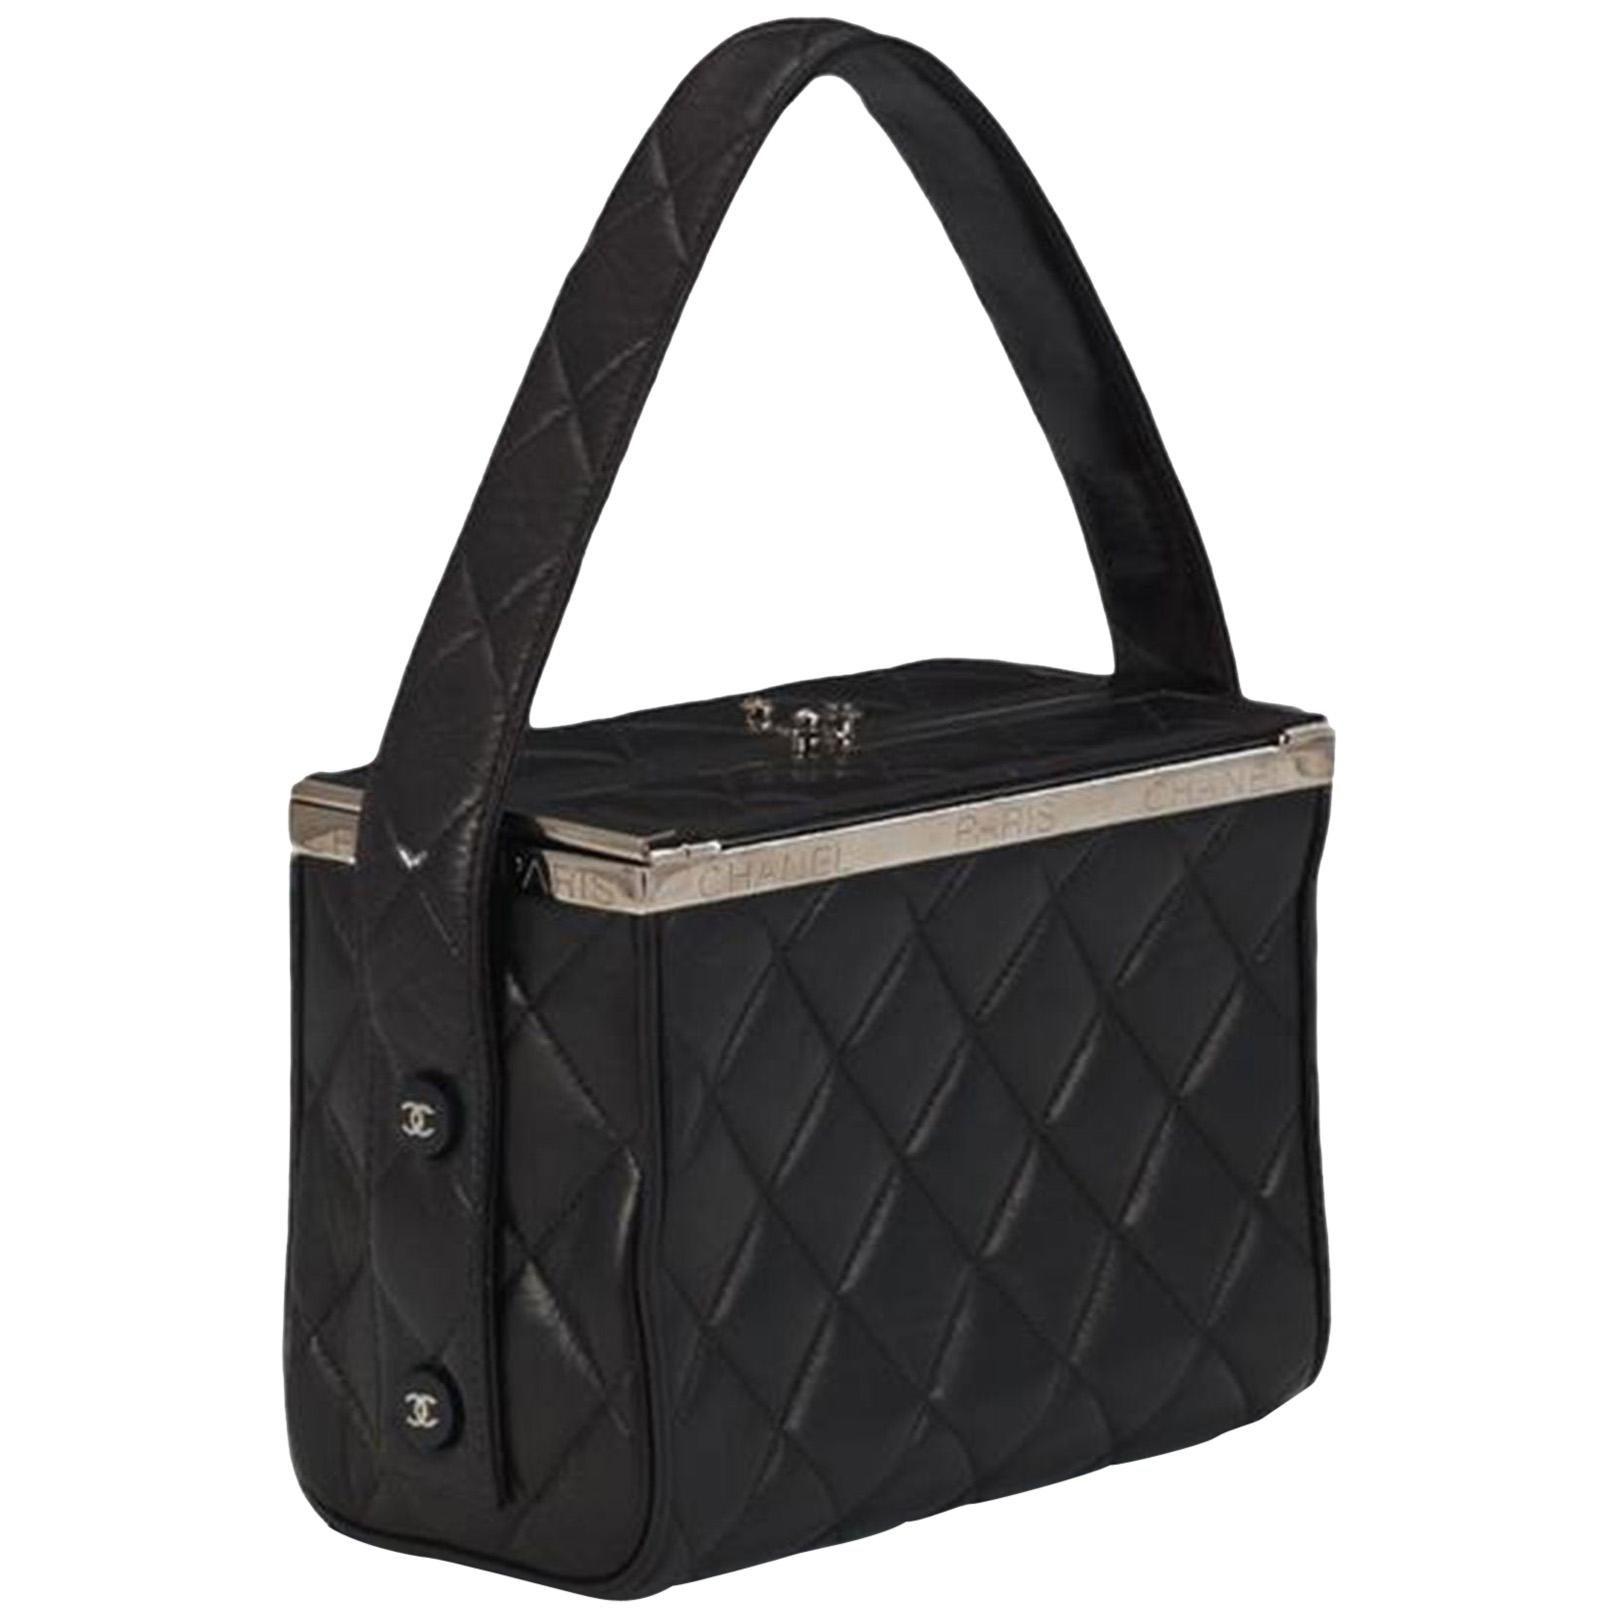 Chanel Minaudière Tote Bag Clutch Mini Vanity Black Calfskin Leather Satchel